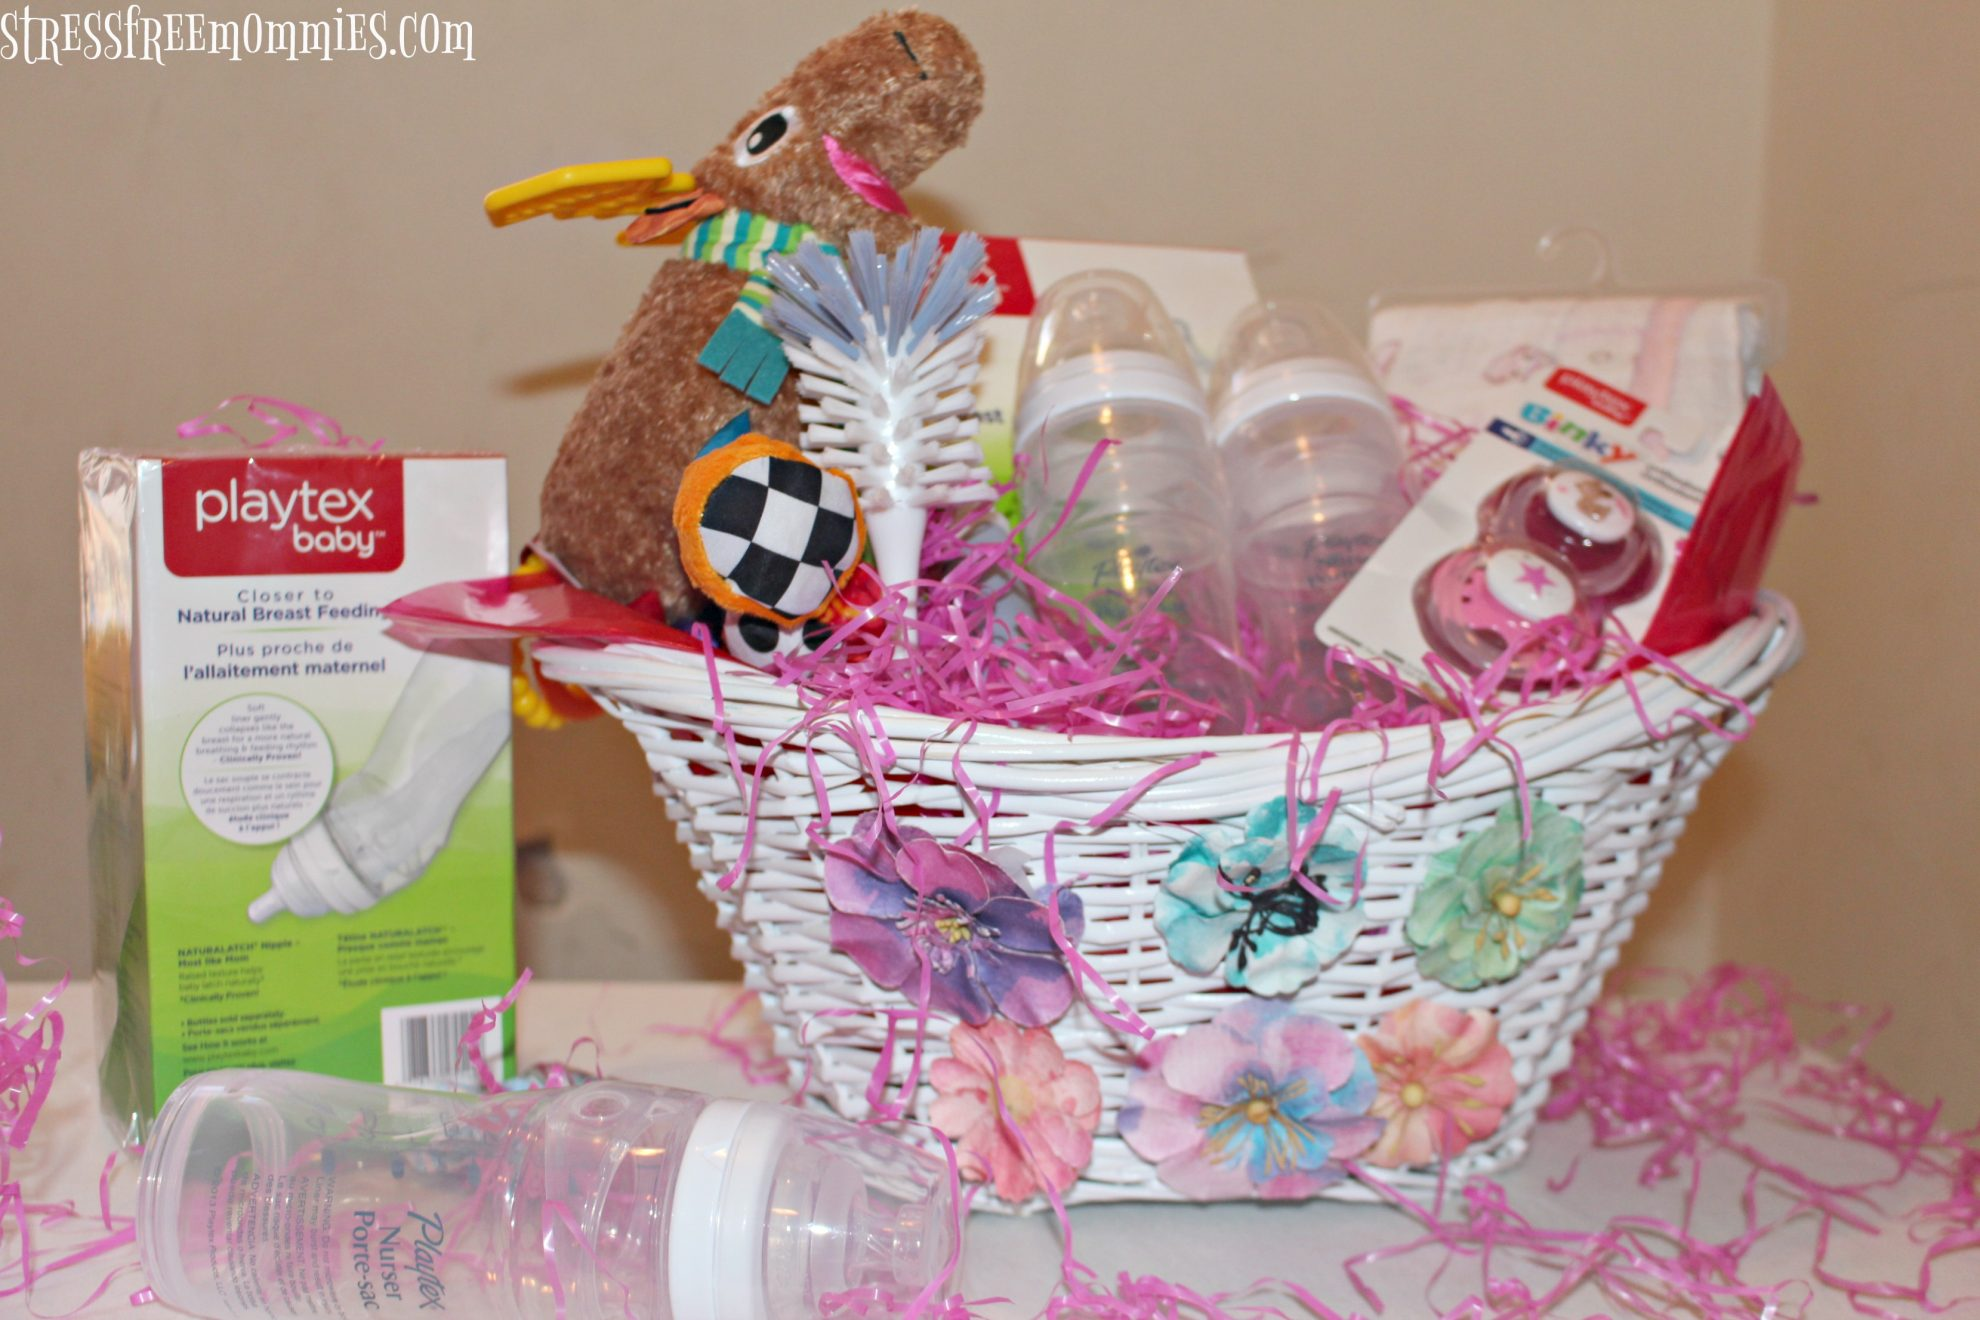 Baby Gift Basket Interflora : Super easy baby shower gift basket